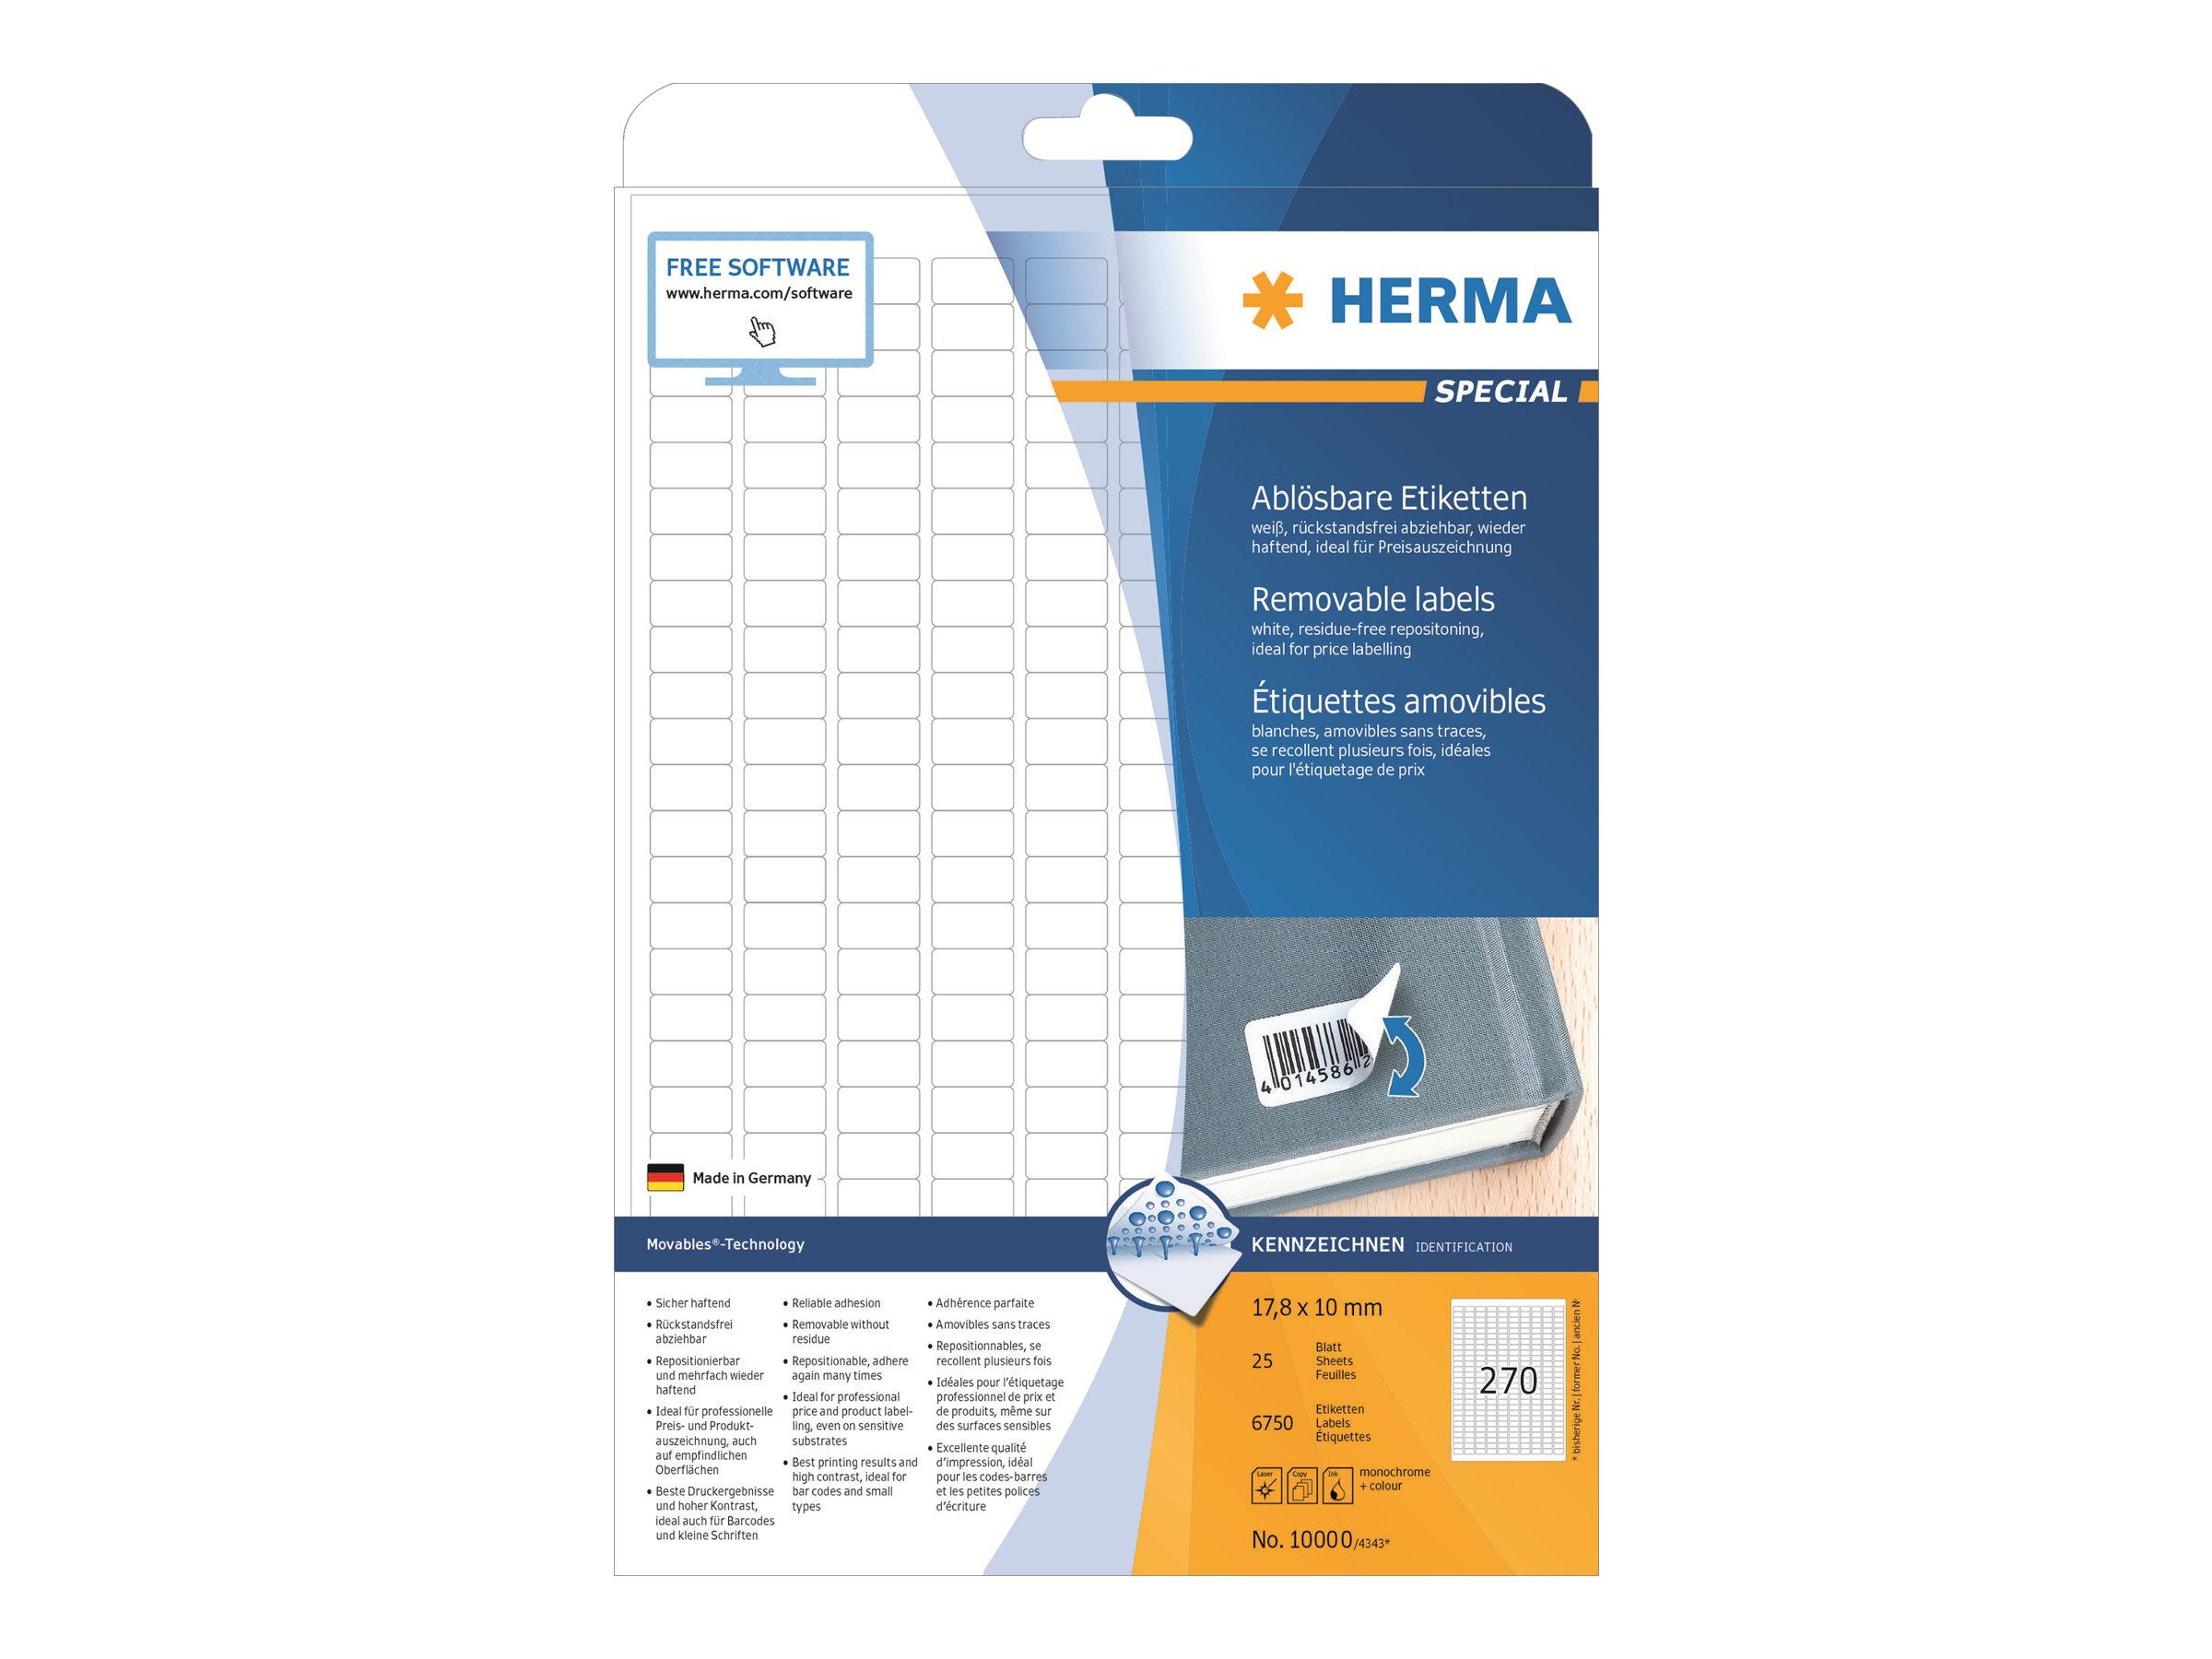 HERMA Special - Papier - matt - selbstklebend, entfernbarer Klebstoff - weiß - 17.8 x 10 mm 6750 Etikett(en) (25 Bogen x 270)